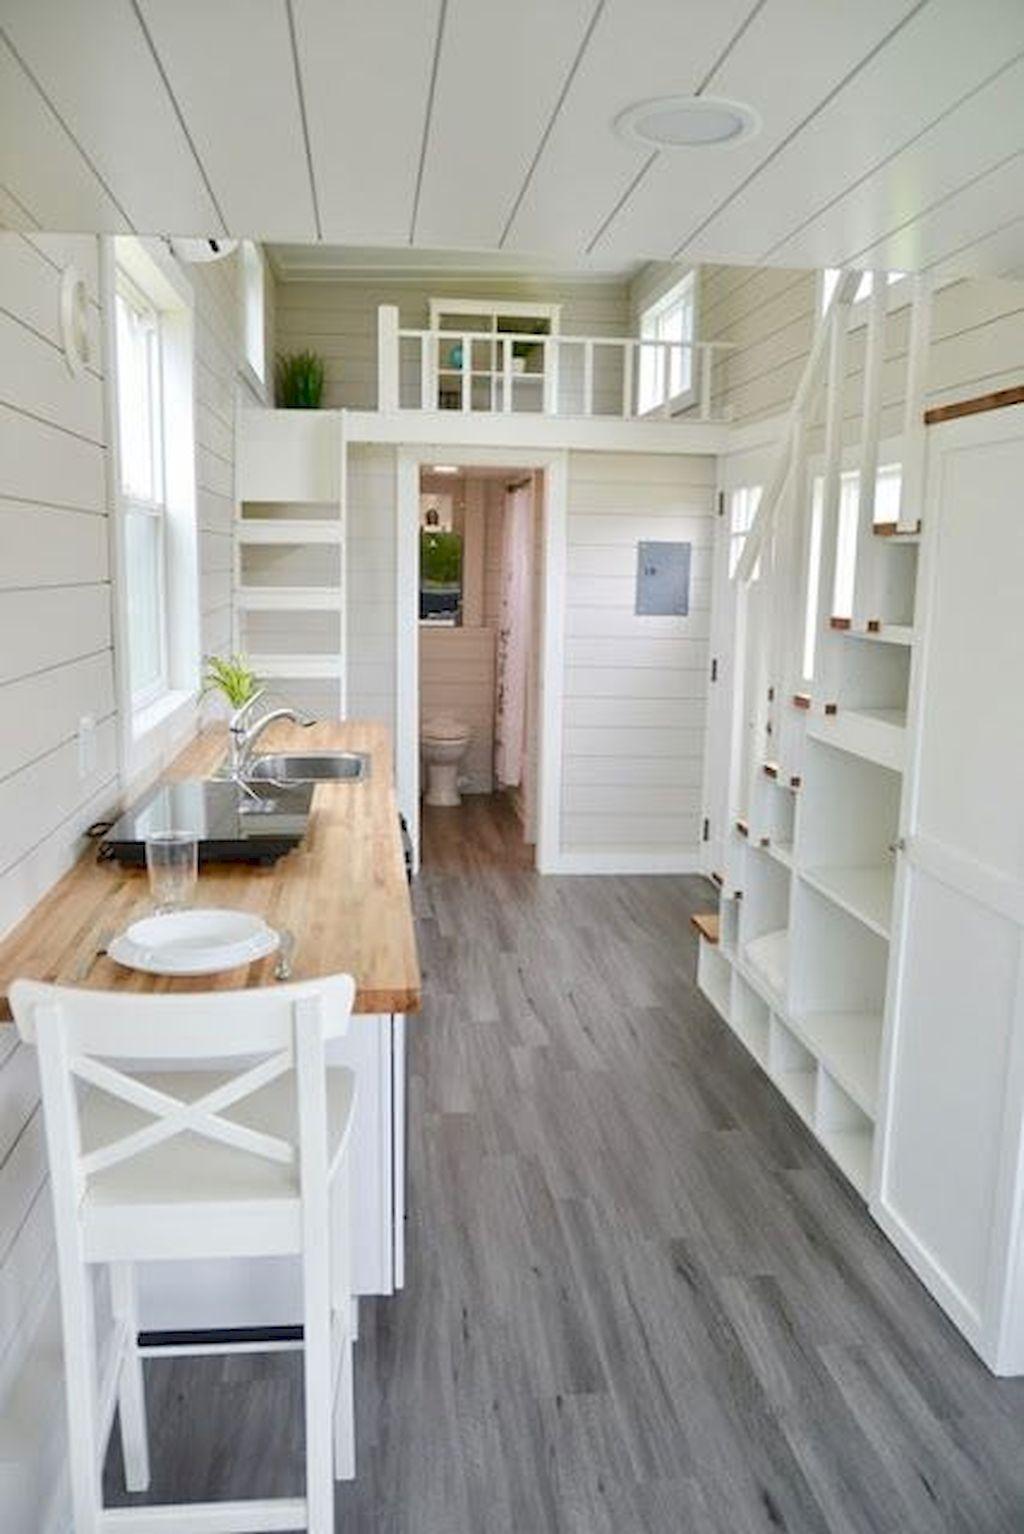 70 Clever Tiny House Interior Design Ideas Decorationroom Tiny House Interior Design Tiny House Decor Best Tiny House